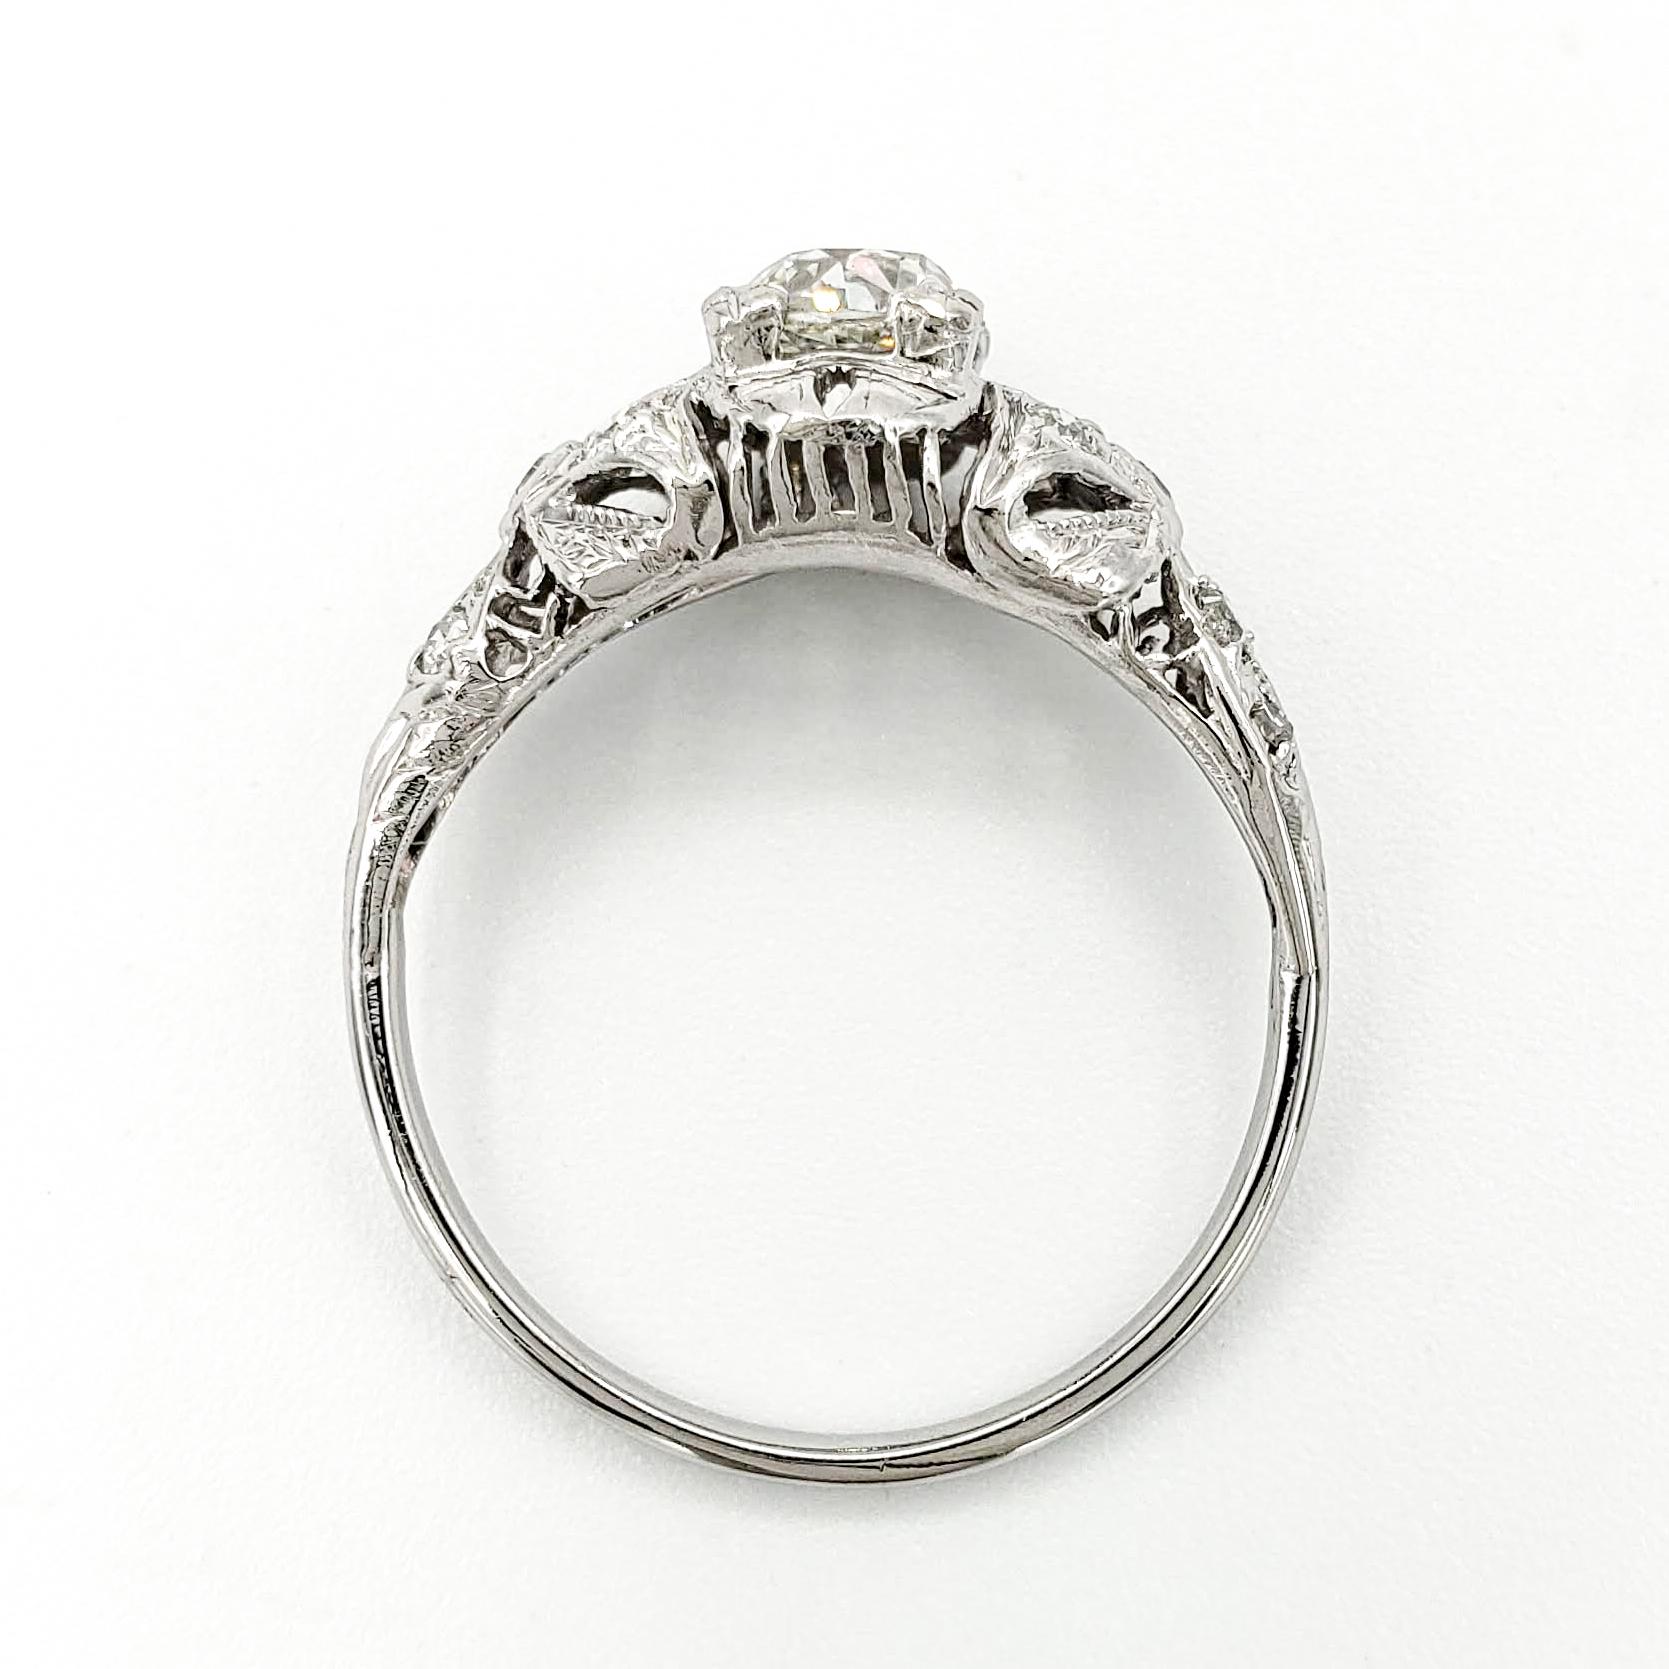 vintage-platinum-engagement-ring-with-0-80-carat-old-mine-cut-diamond-gia-j-si2